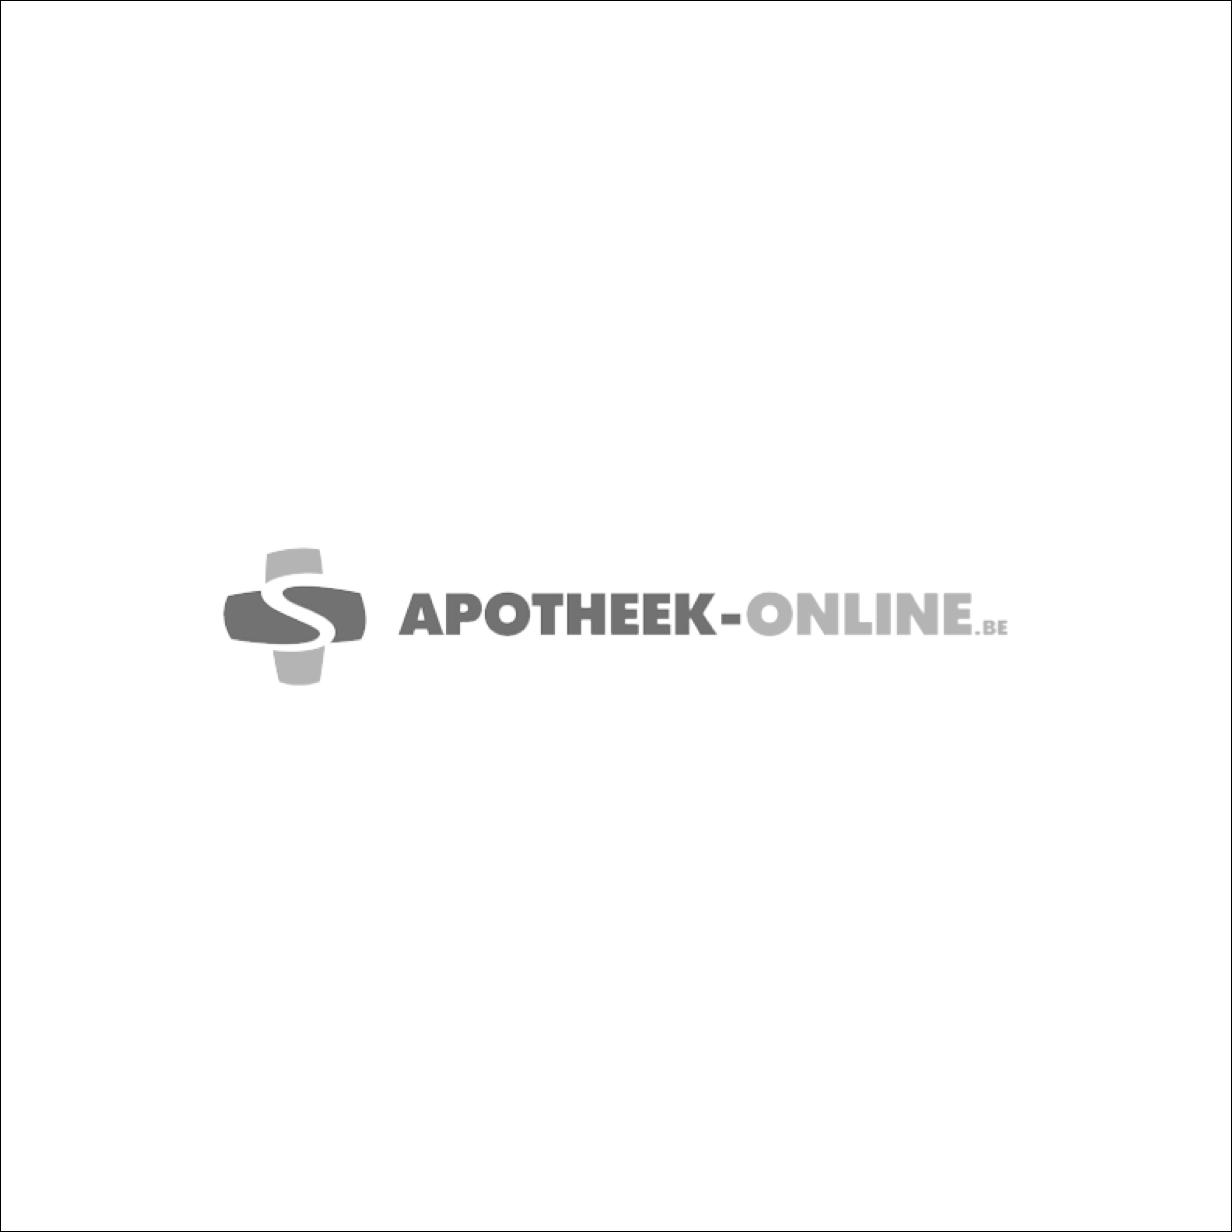 Mollelast Haft Bande Adh Latex Free 6cmx 4m 89591